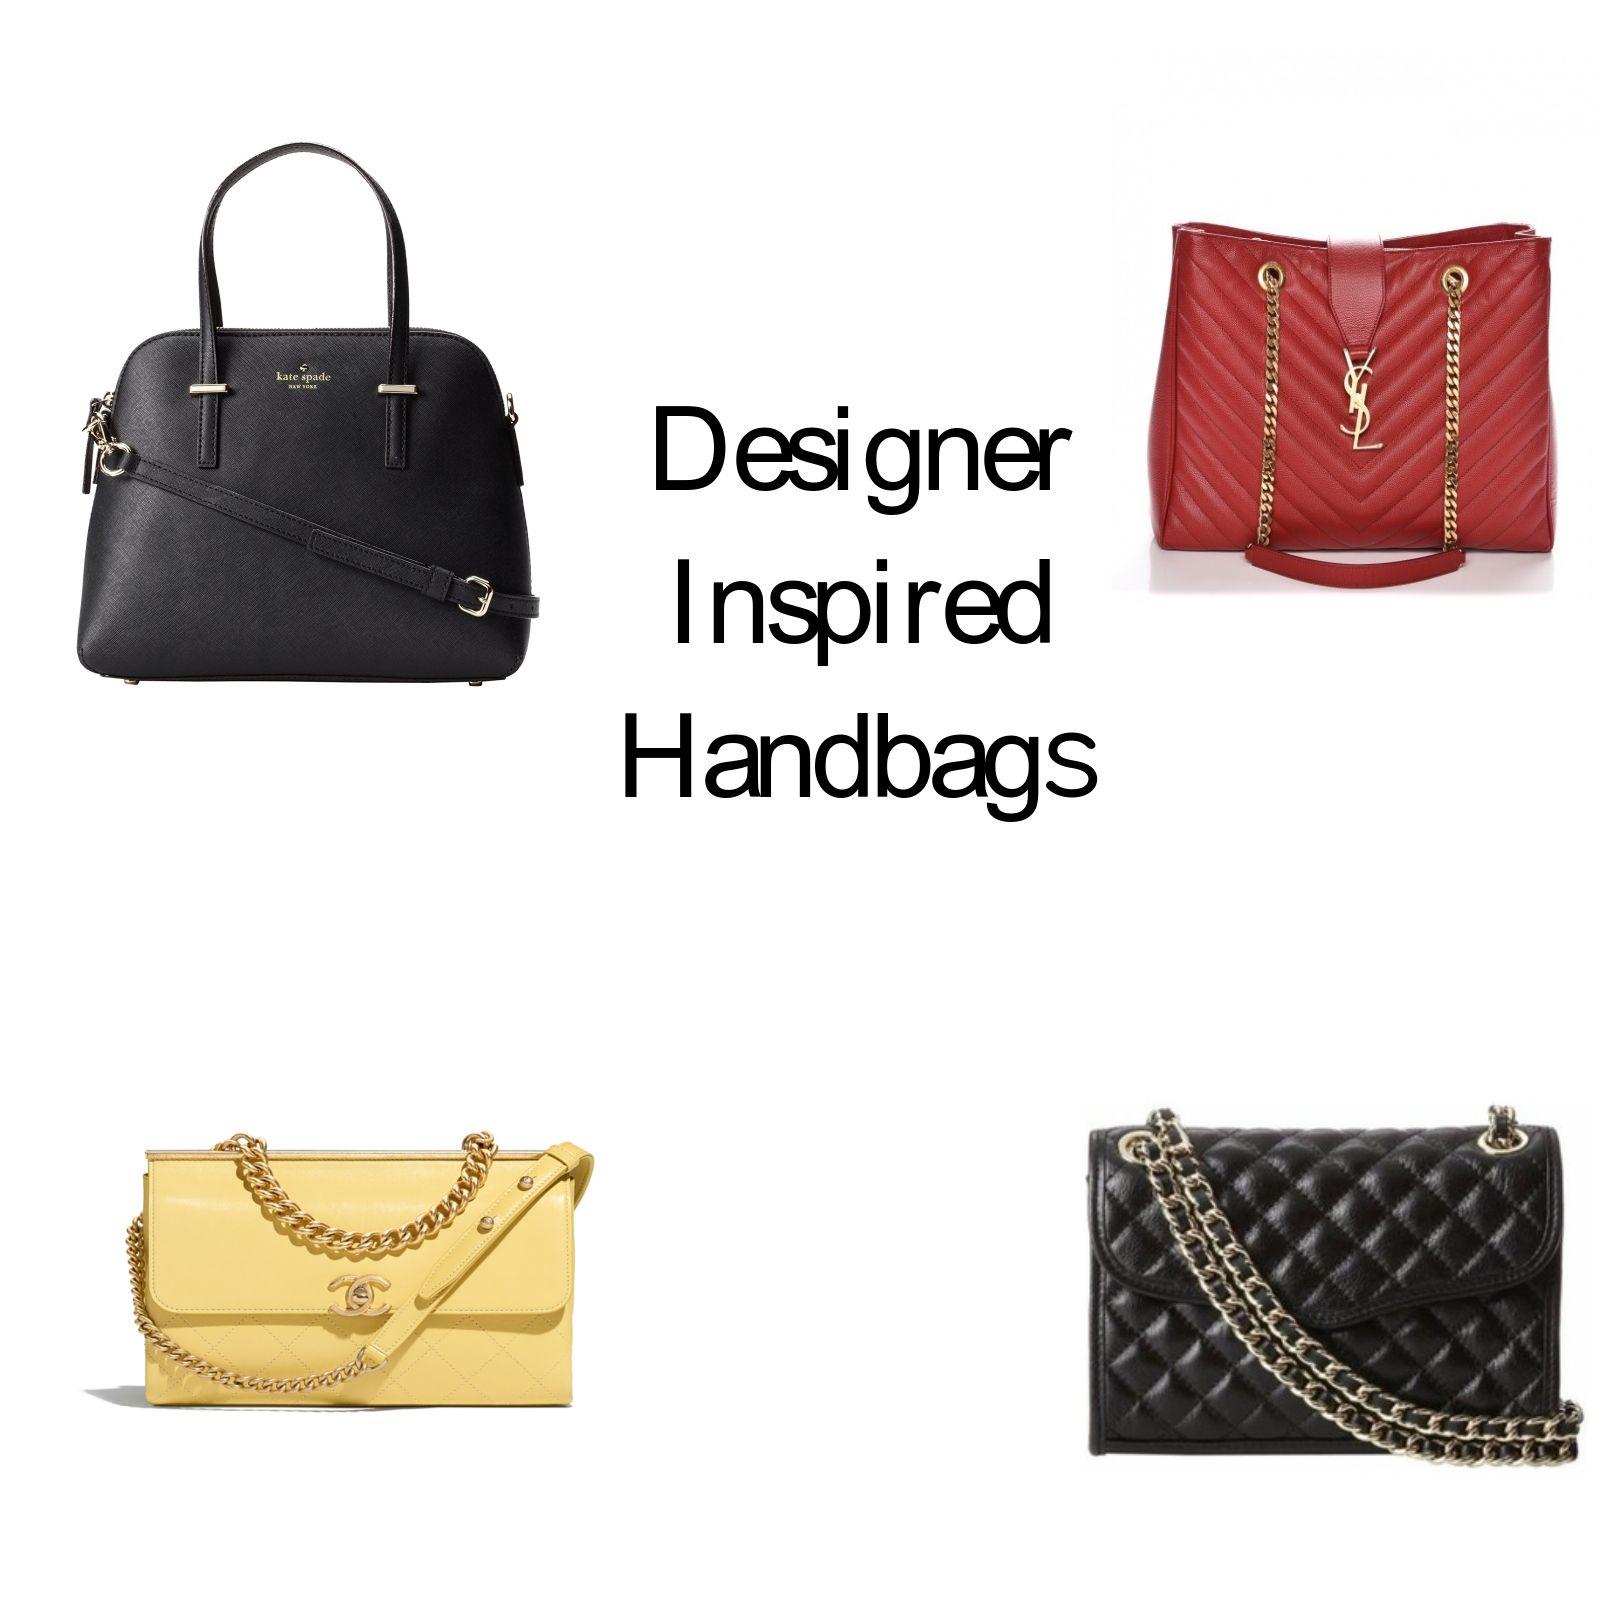 Designer Inspired Handbags Cheryc